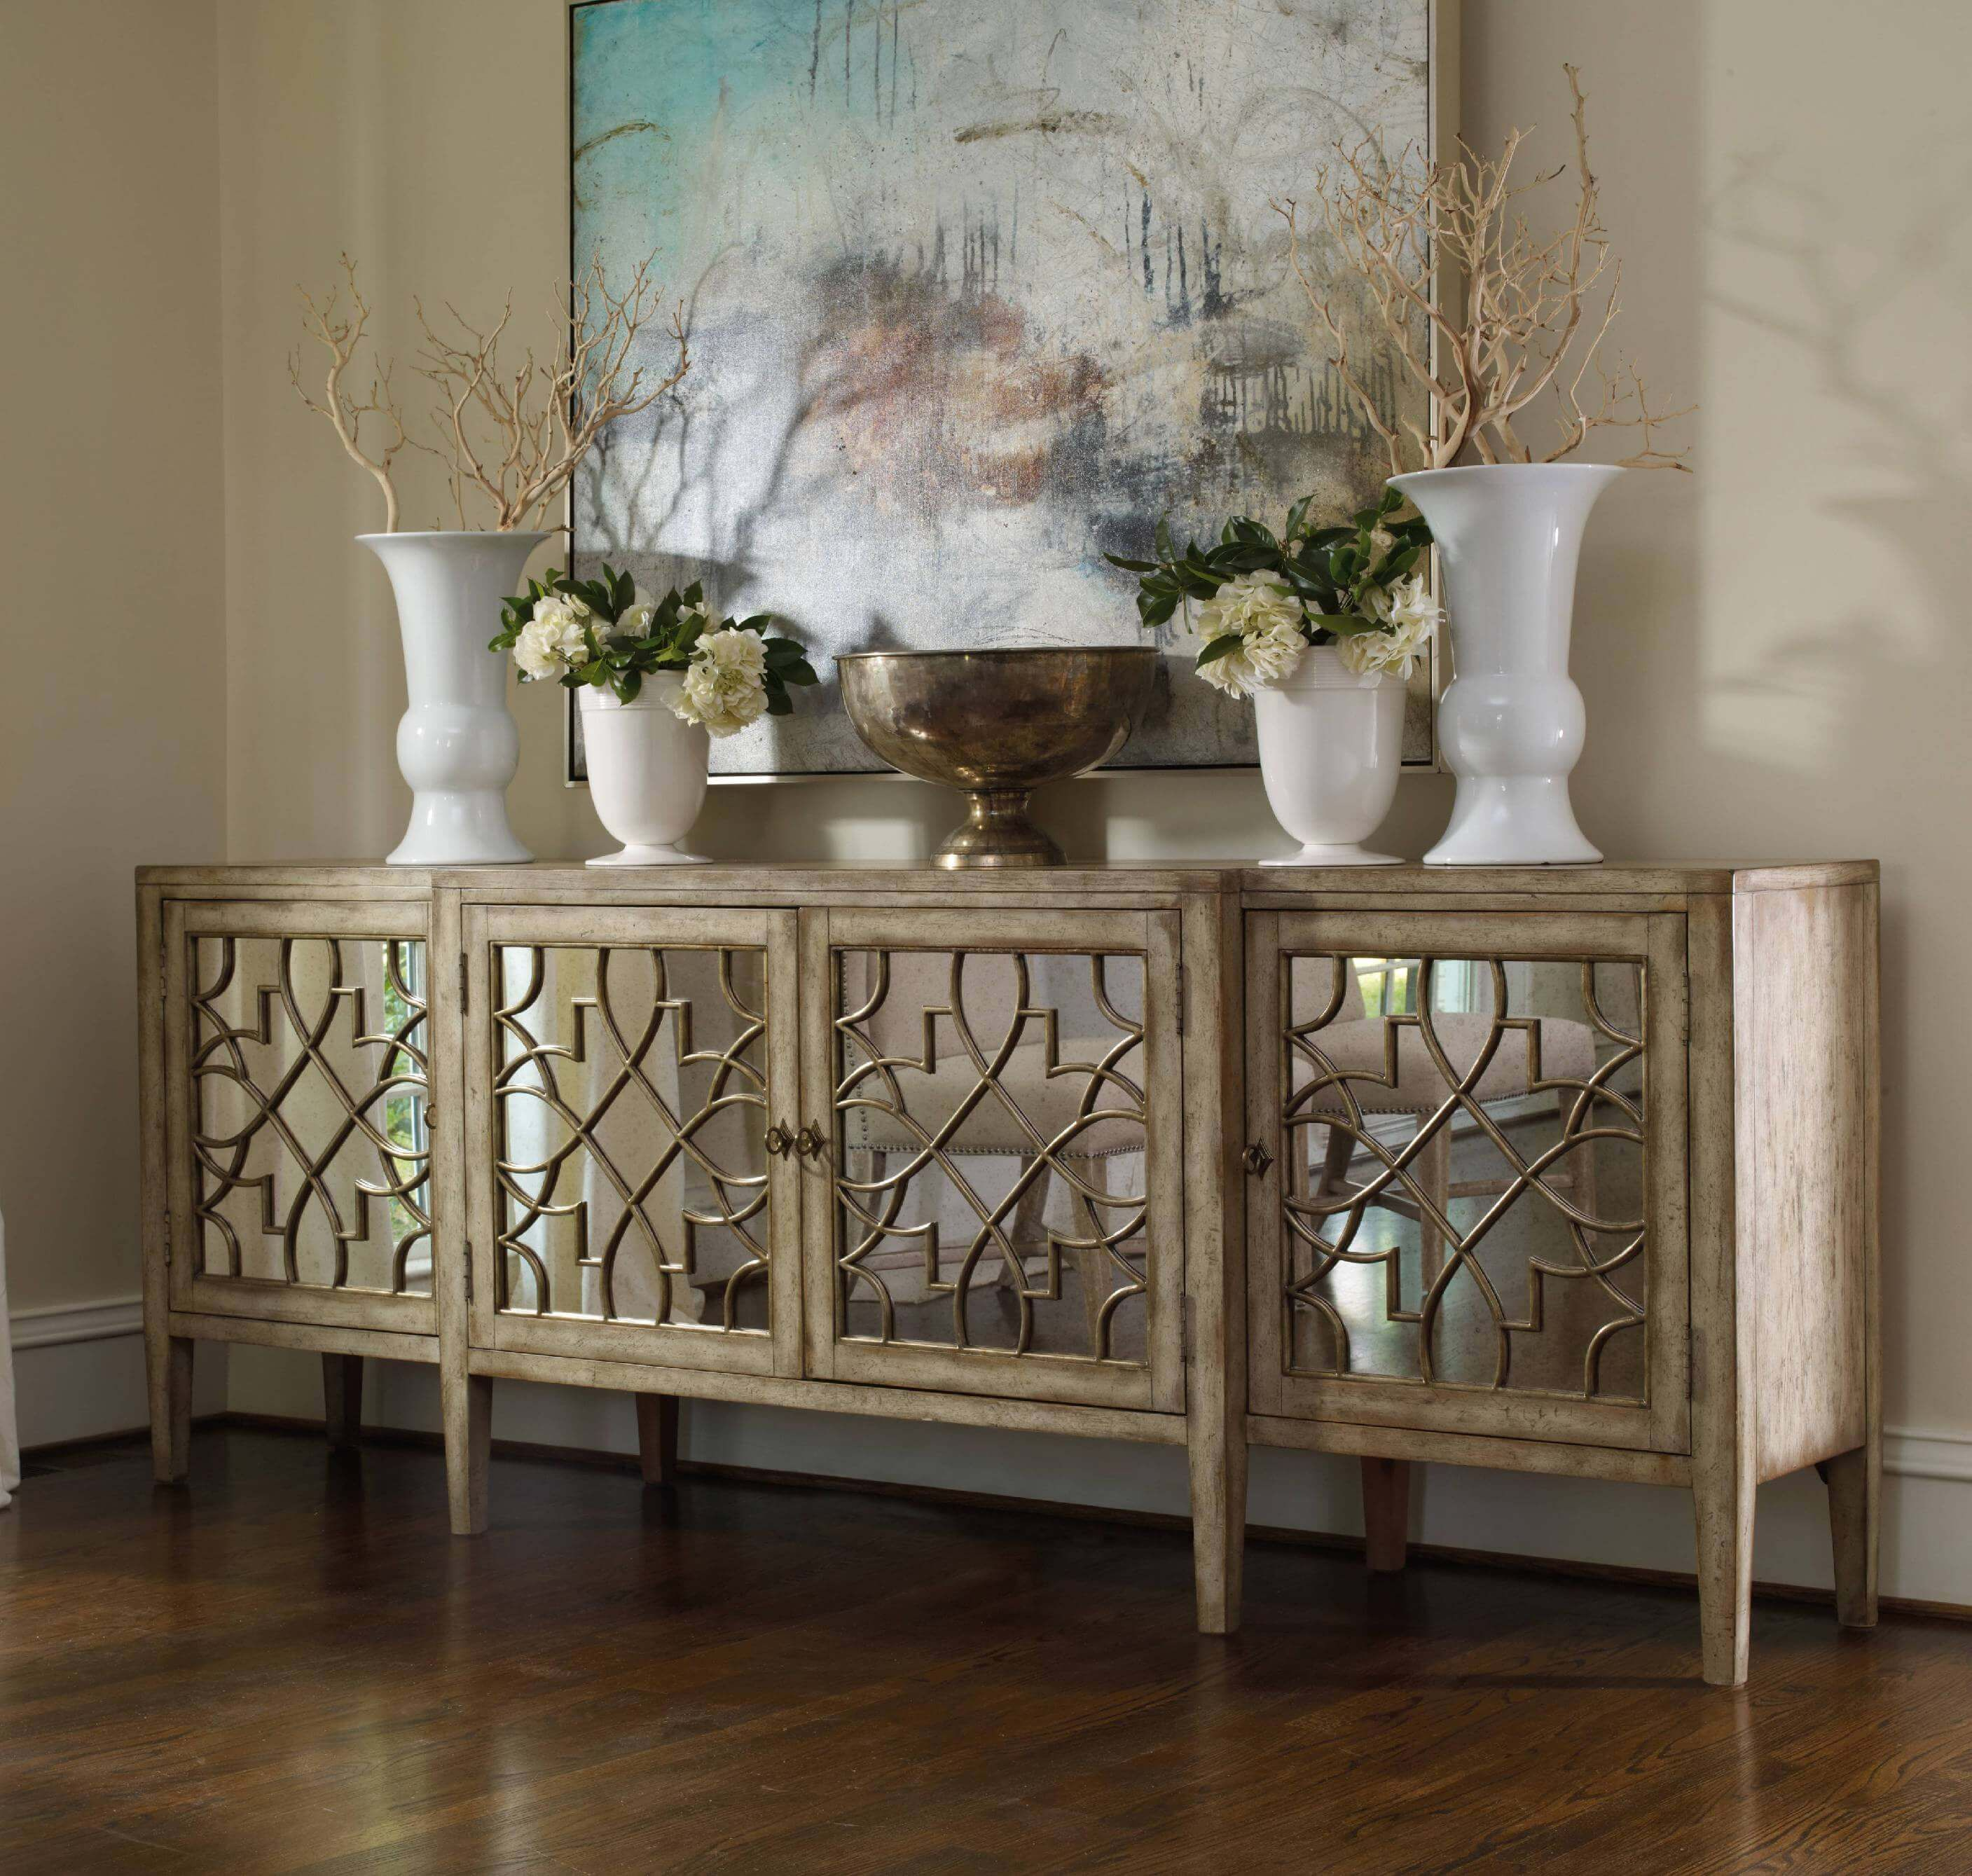 30 Elegant And Antique Inspired Rustic Glam Decorations Part 43